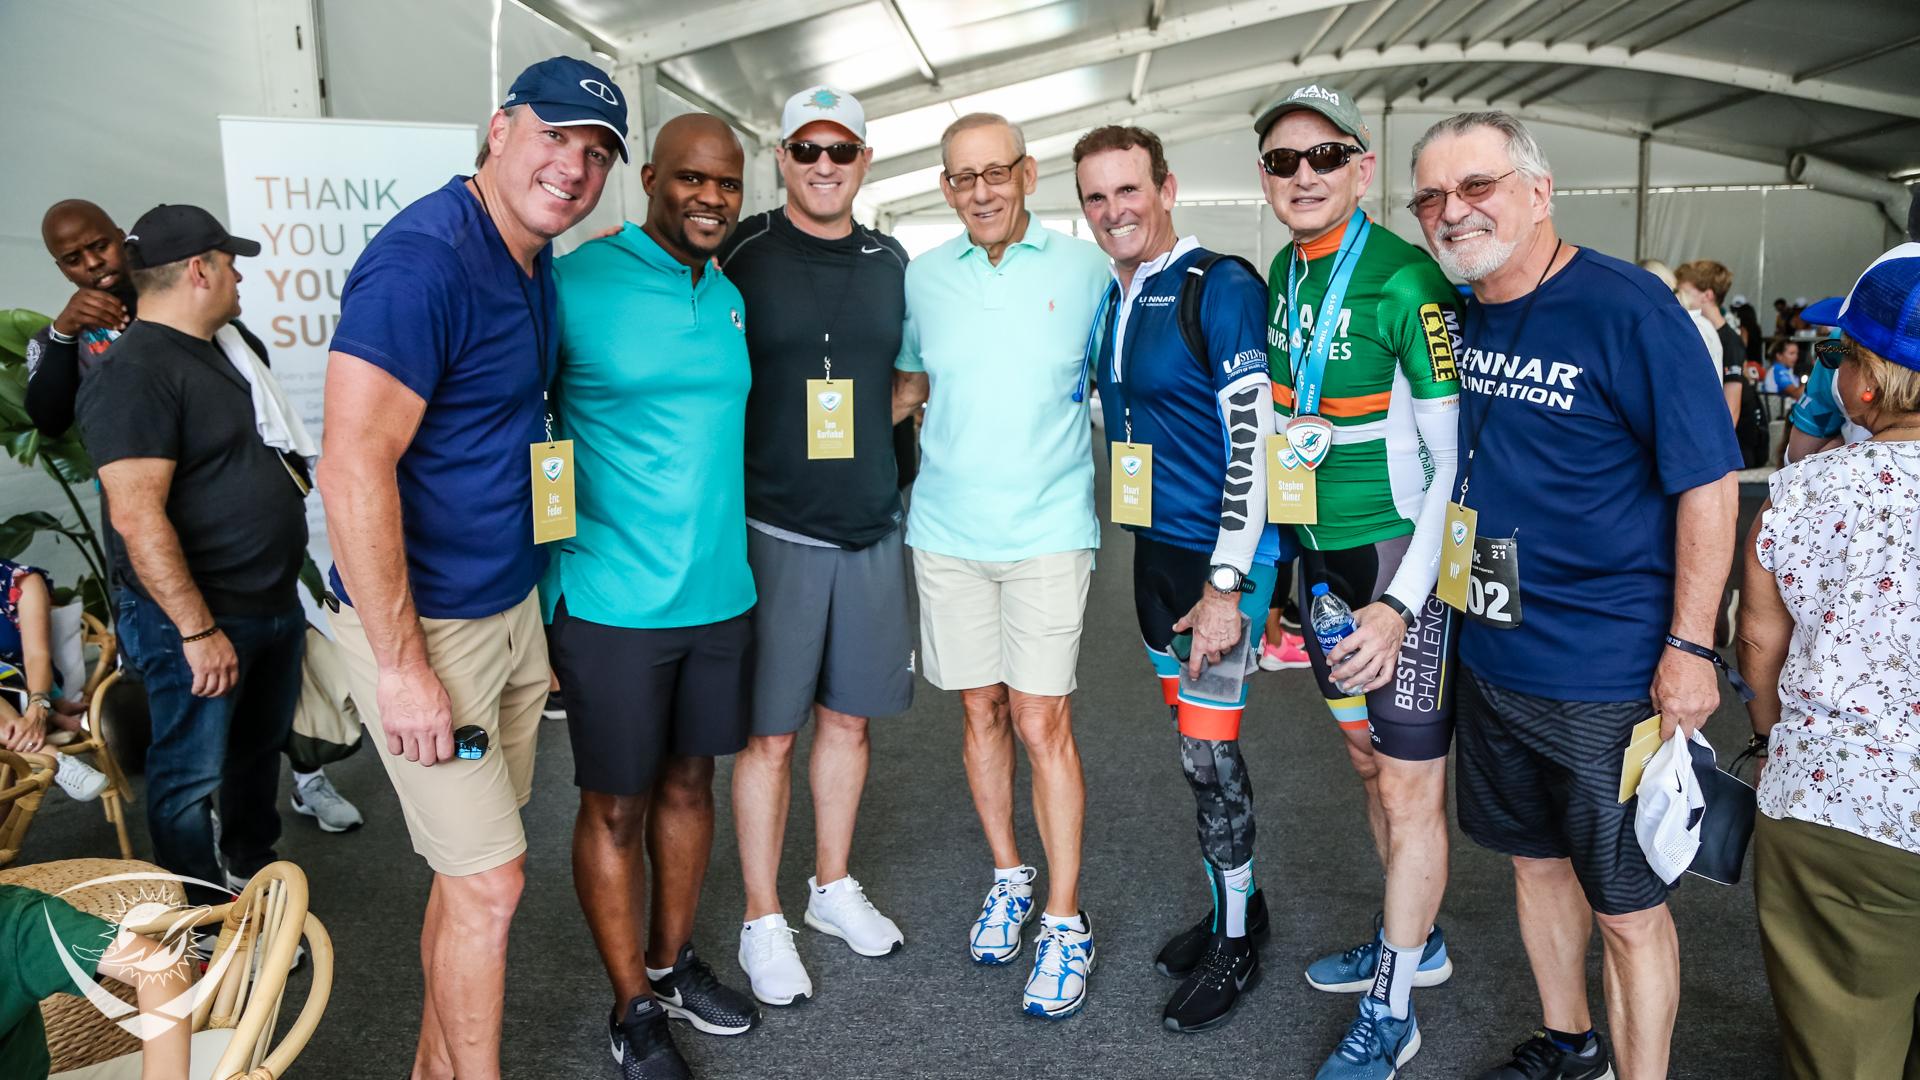 (L-R) Eric Feder, Brian Flores, Tom Garf